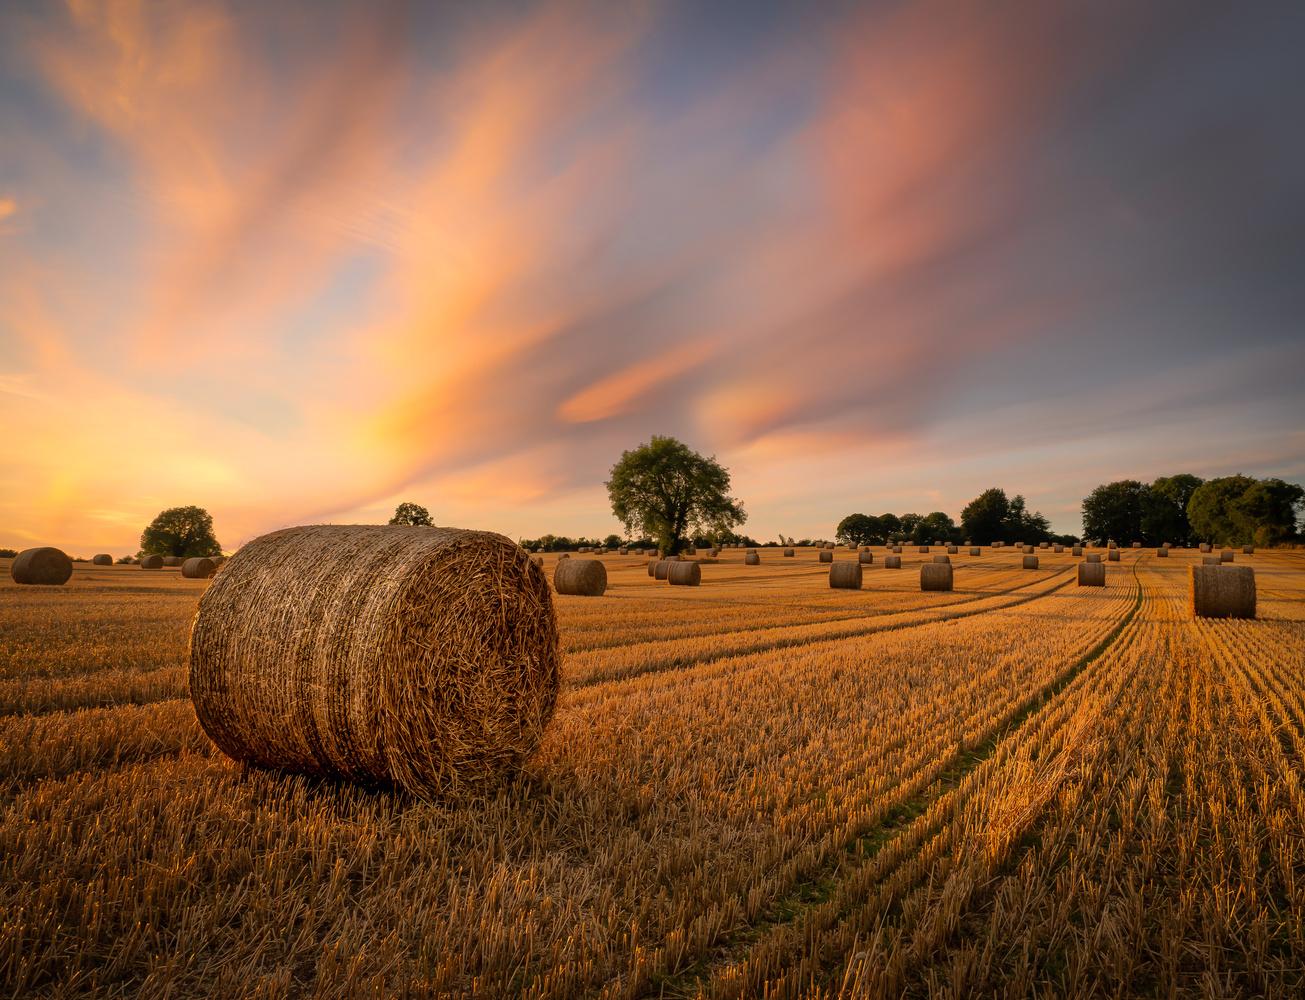 Straw Bales Sunset by Sean O' Riordan